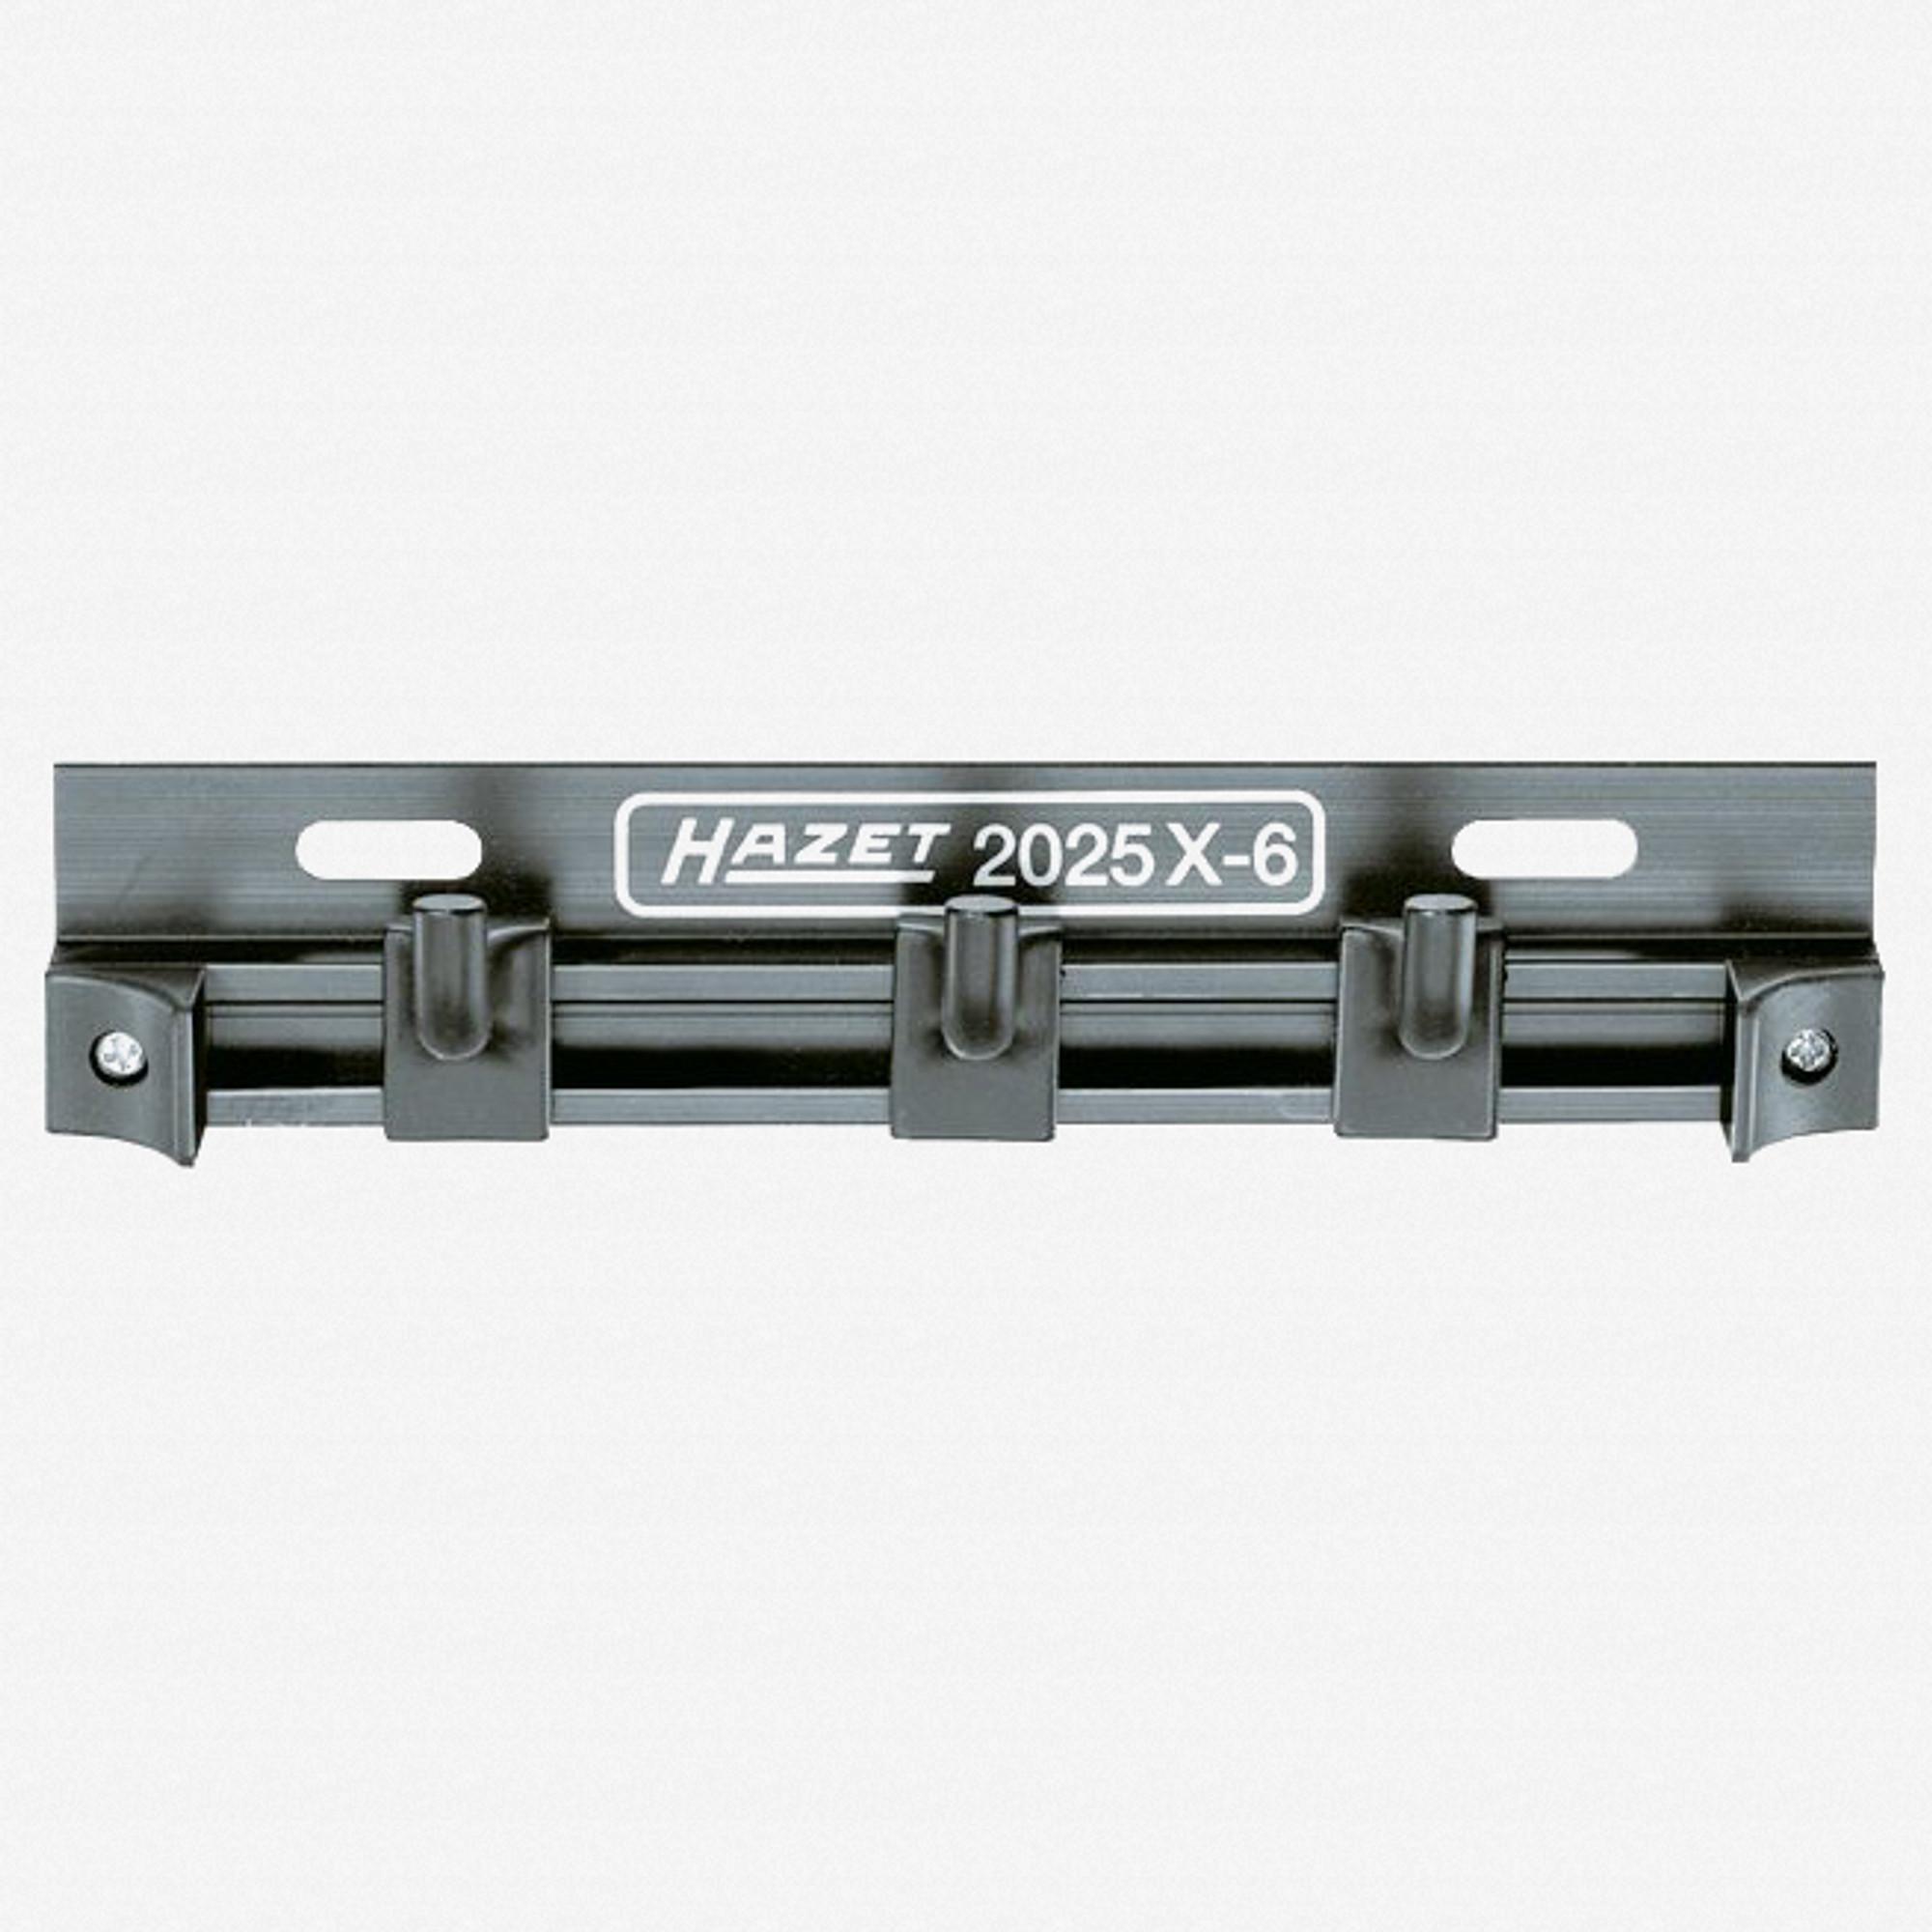 HAZET Guiding rail 2025X-5